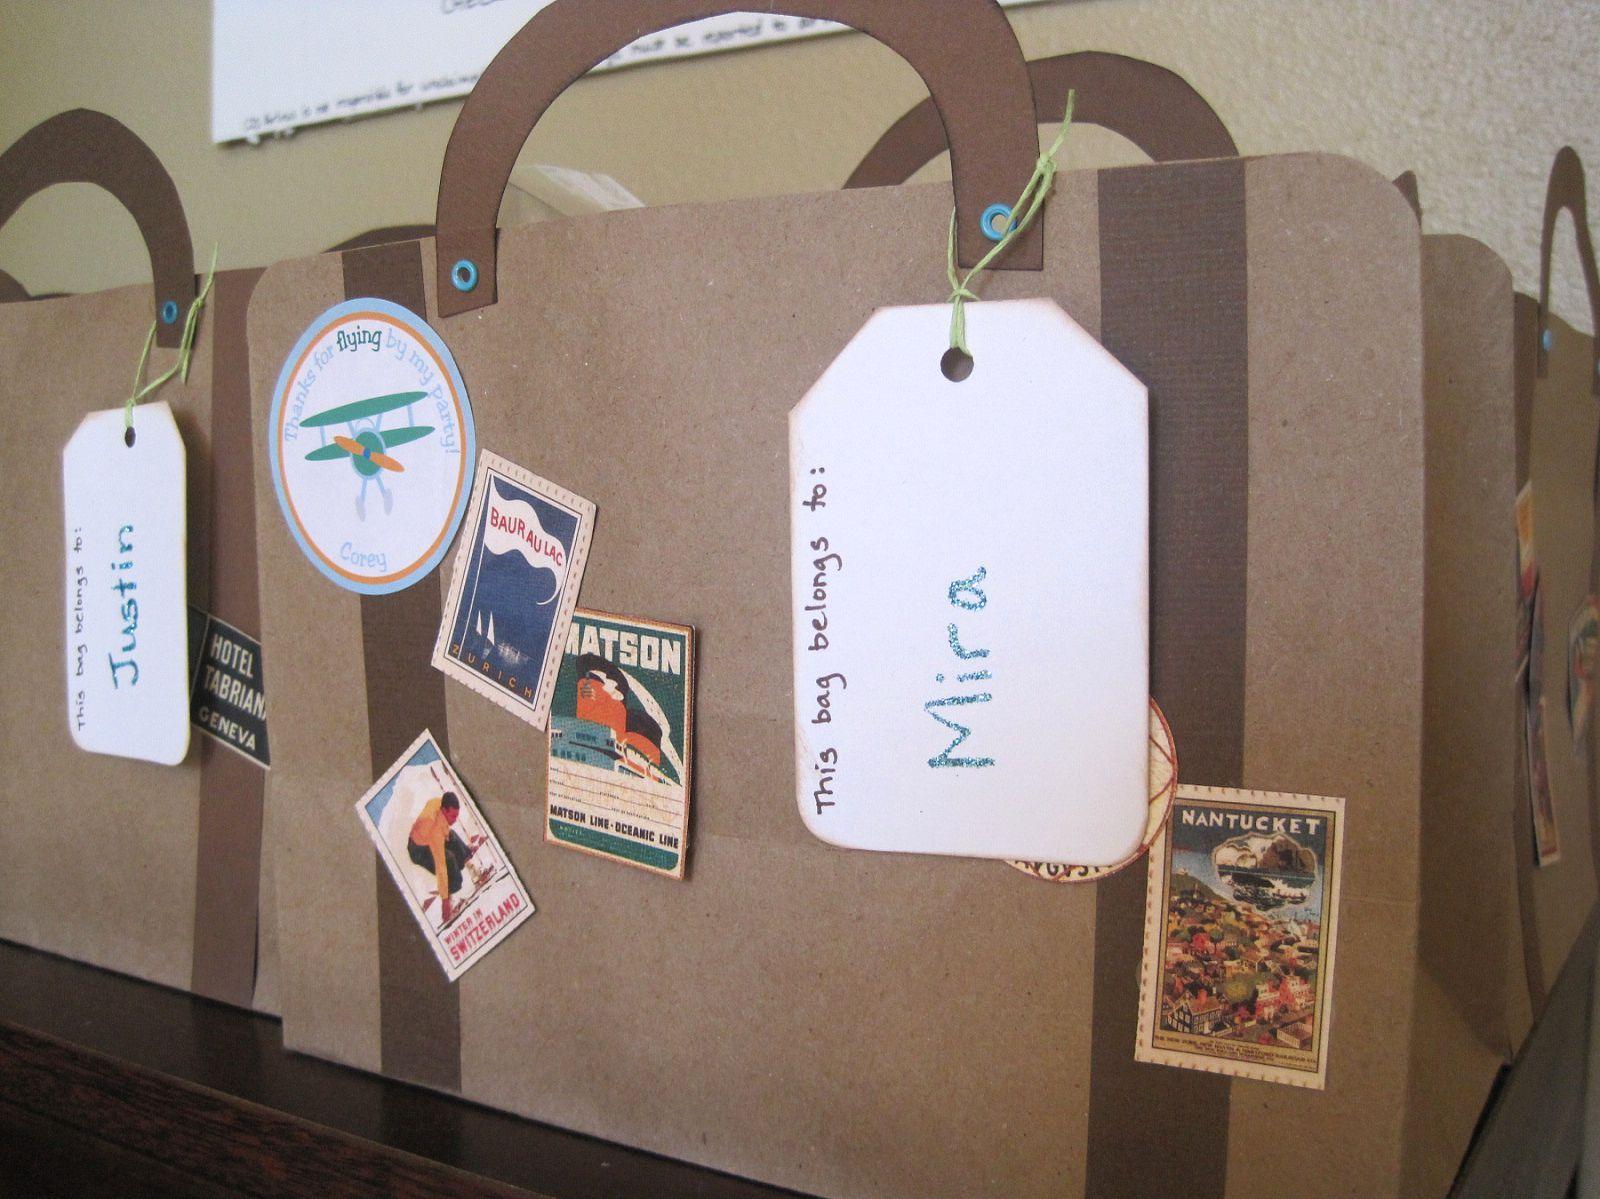 TRAVEL BRADS Plane Camera Luggage Vacation Holiday Scrapbooking Card Making